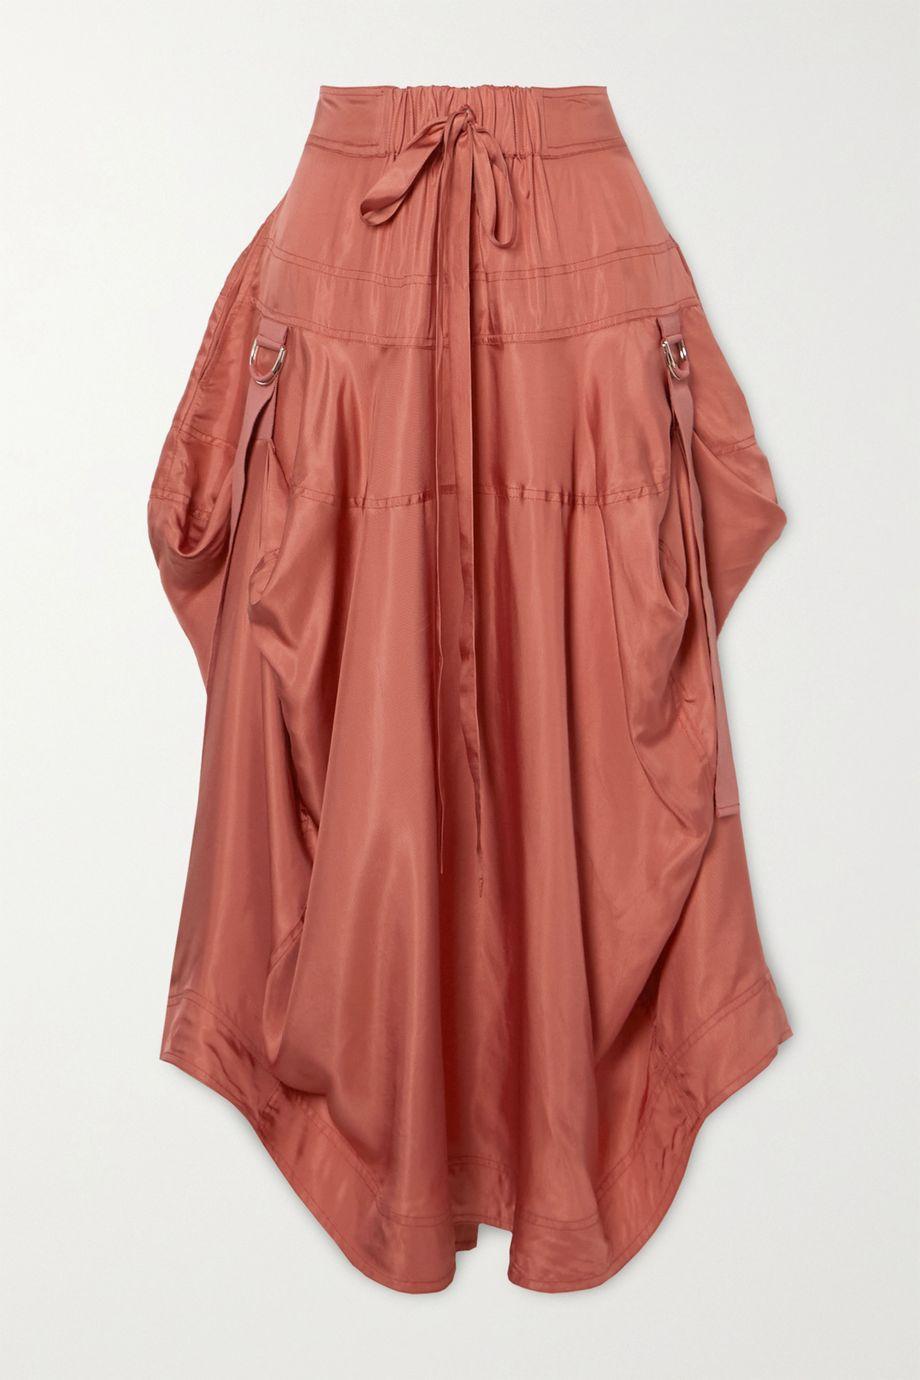 Lee Mathews Edie draped satin-twill midi skirt